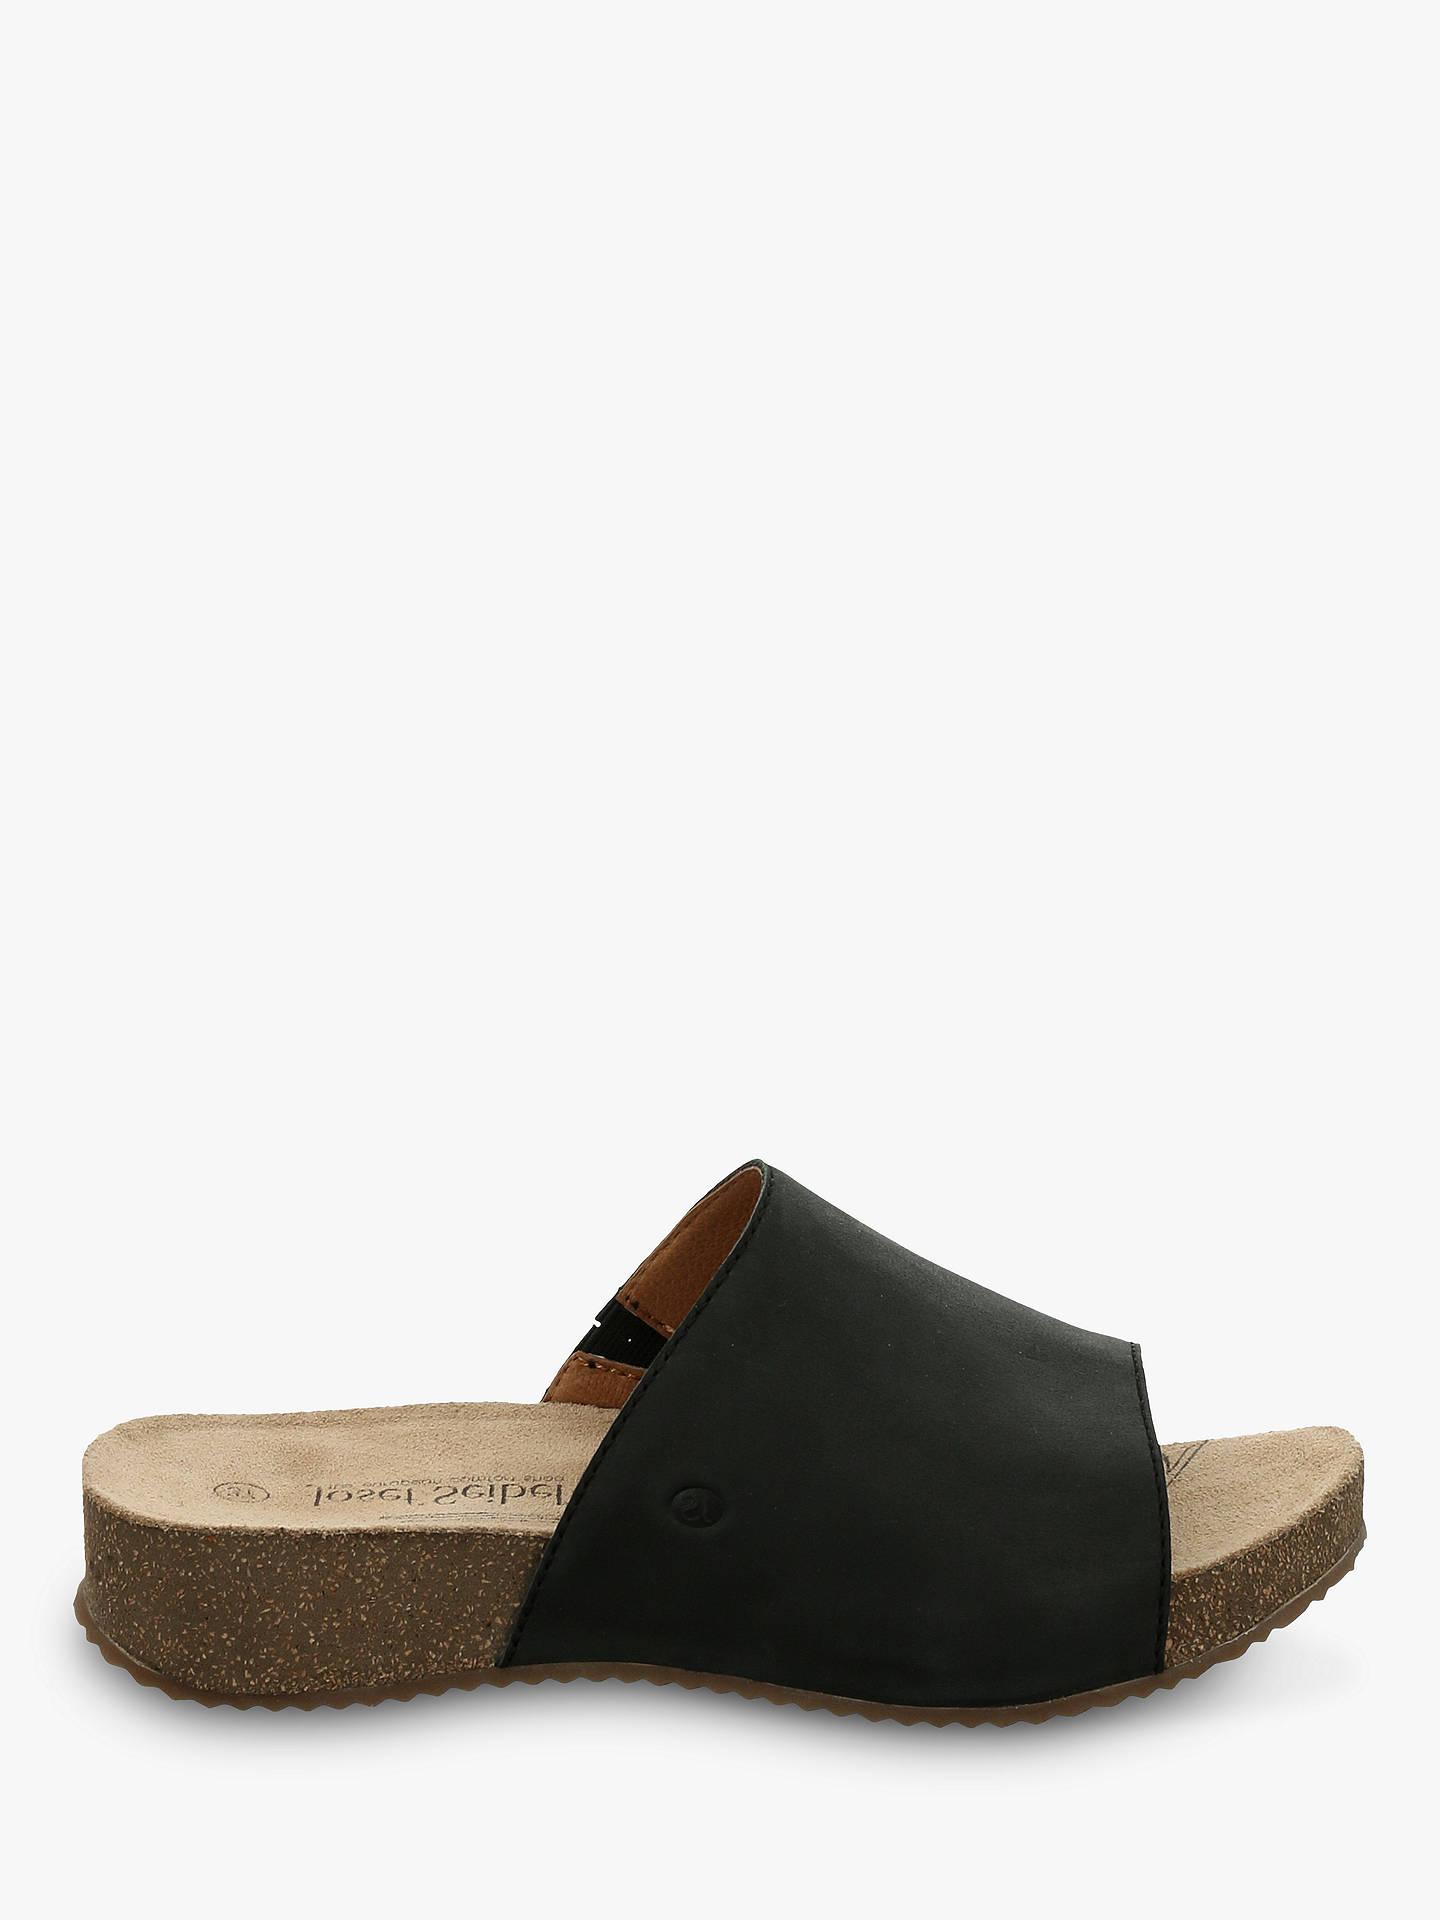 john lewis seibel ladies sandals